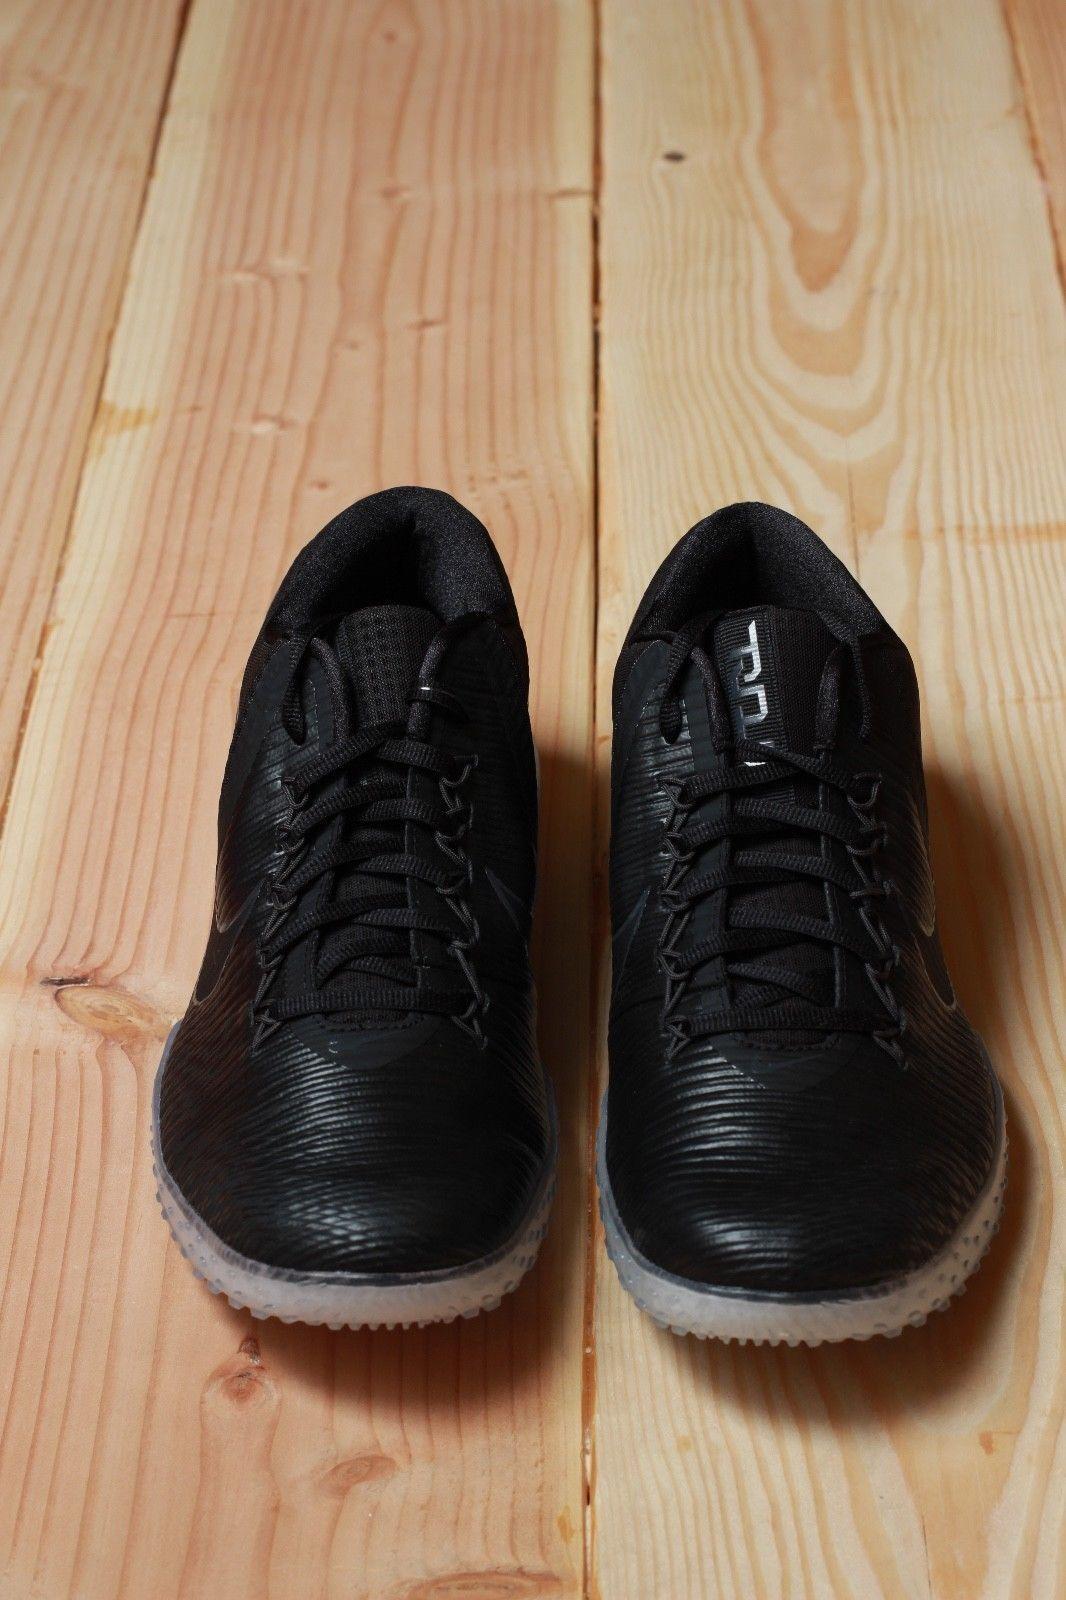 Nike Zoom Trout 3 TF Turf Baseball Shoes Black Anthracite Ice 844628-001 Sz 8.5